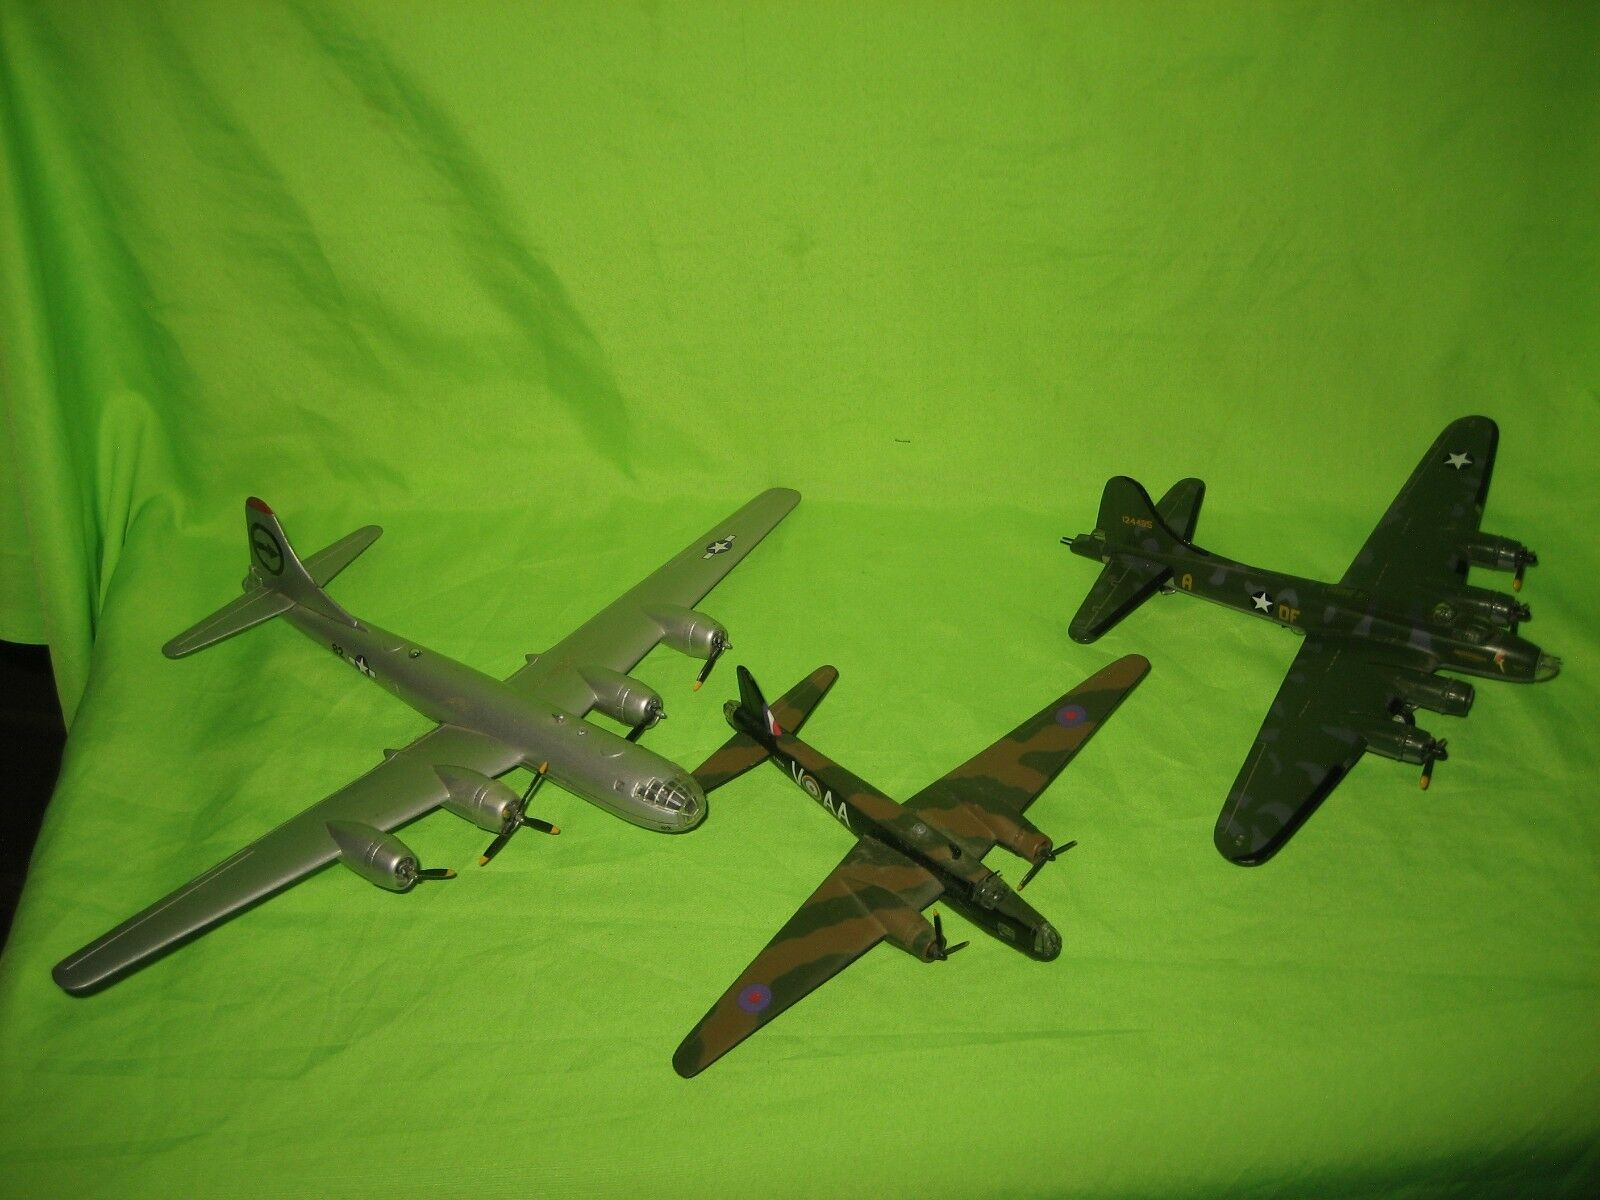 3 X  AIRPLANES ENOLA GAY , MEMPHIS BELLE METAL  DIECAST AIRCRAFTS MODELS